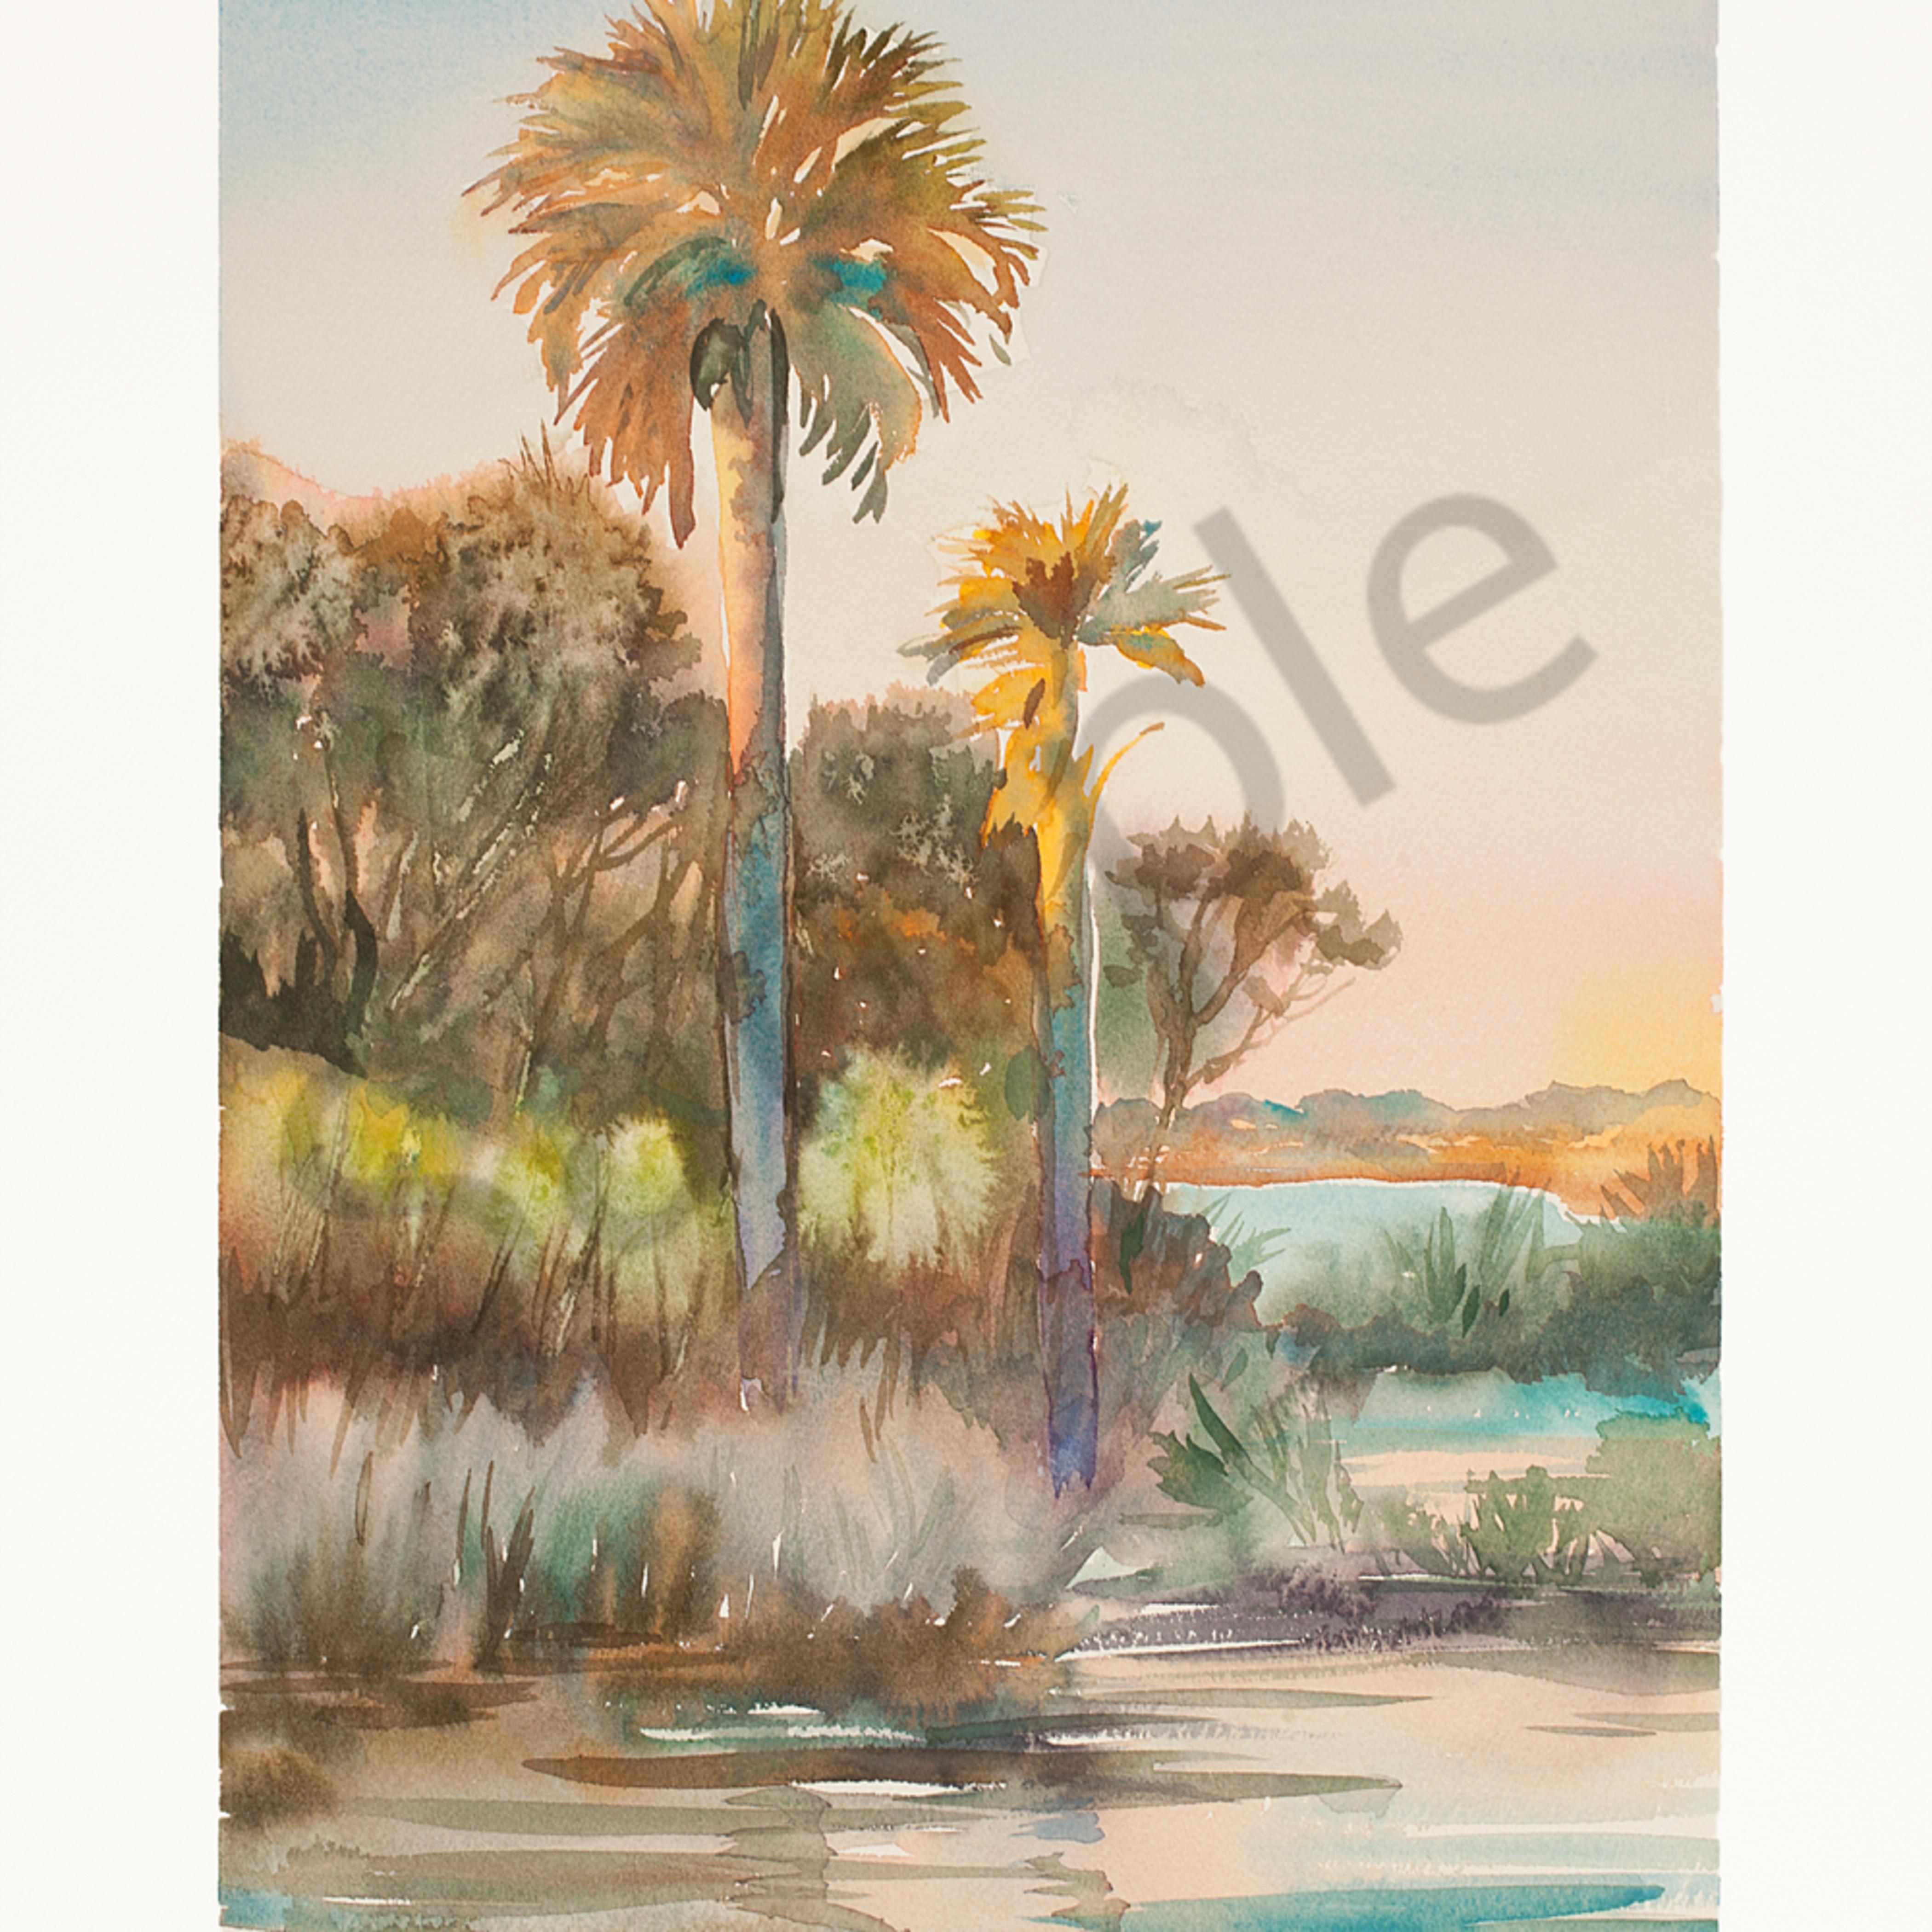 Guana palms 14 22x20 22 wc cp n52lz8